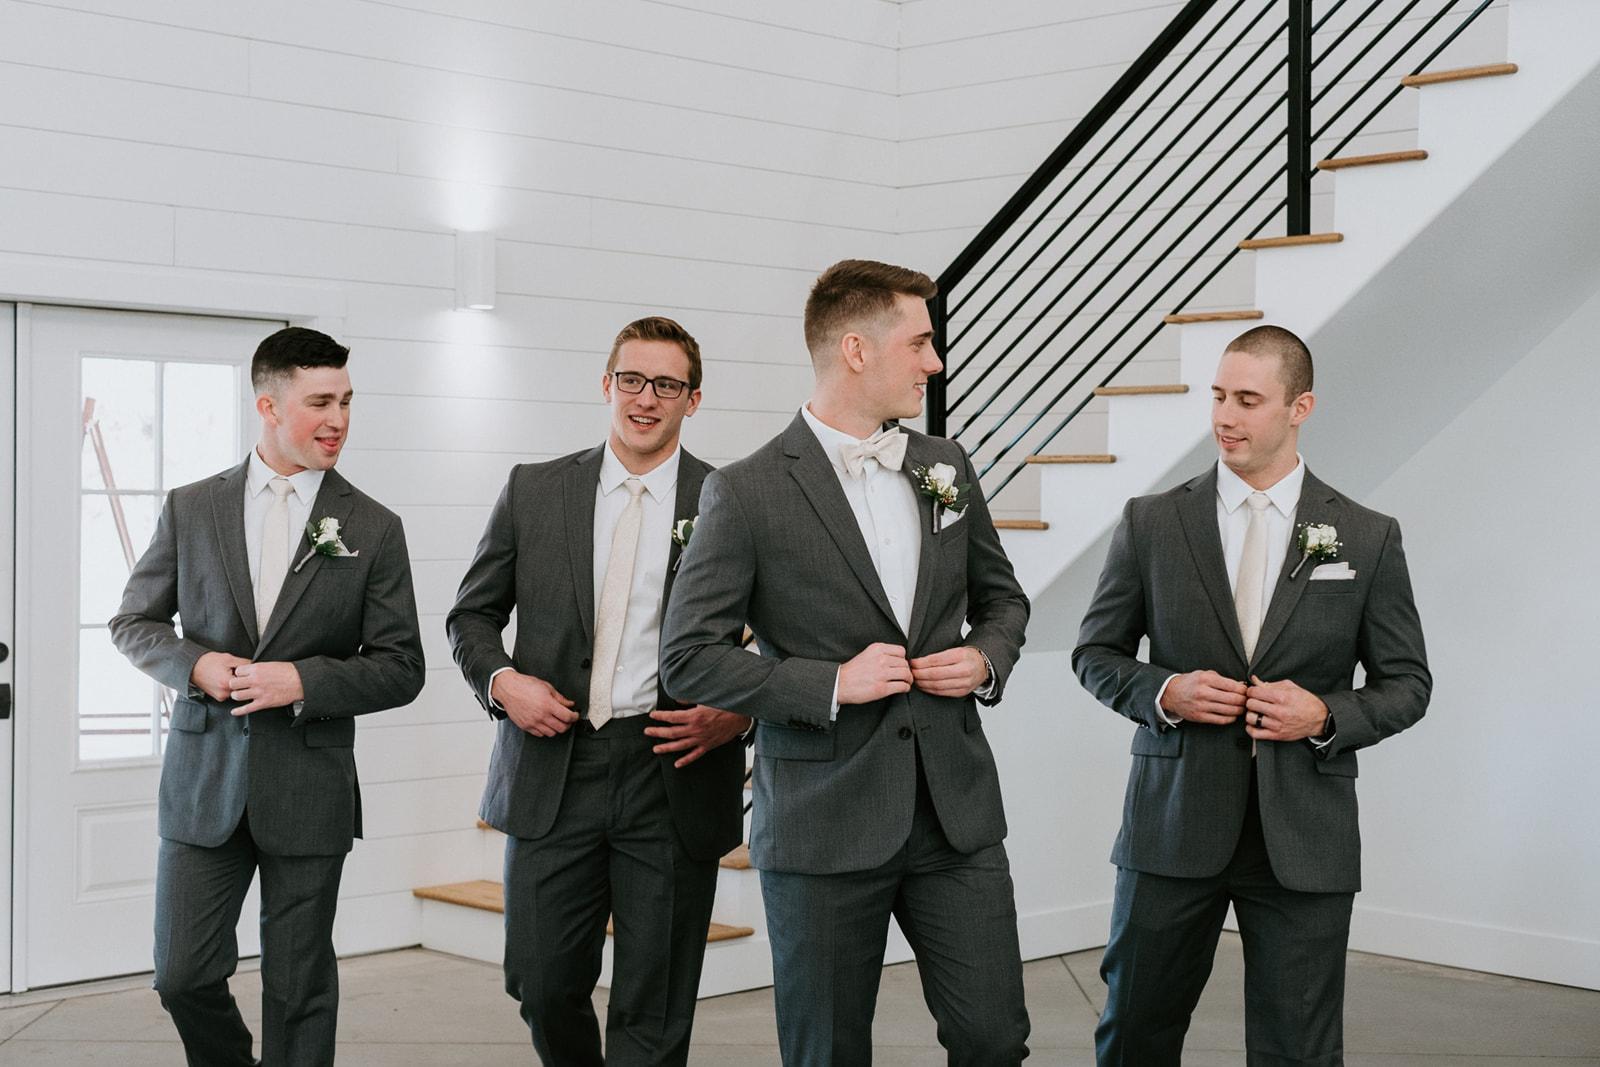 Sanburn-Wedding-Teasers-57.jpg